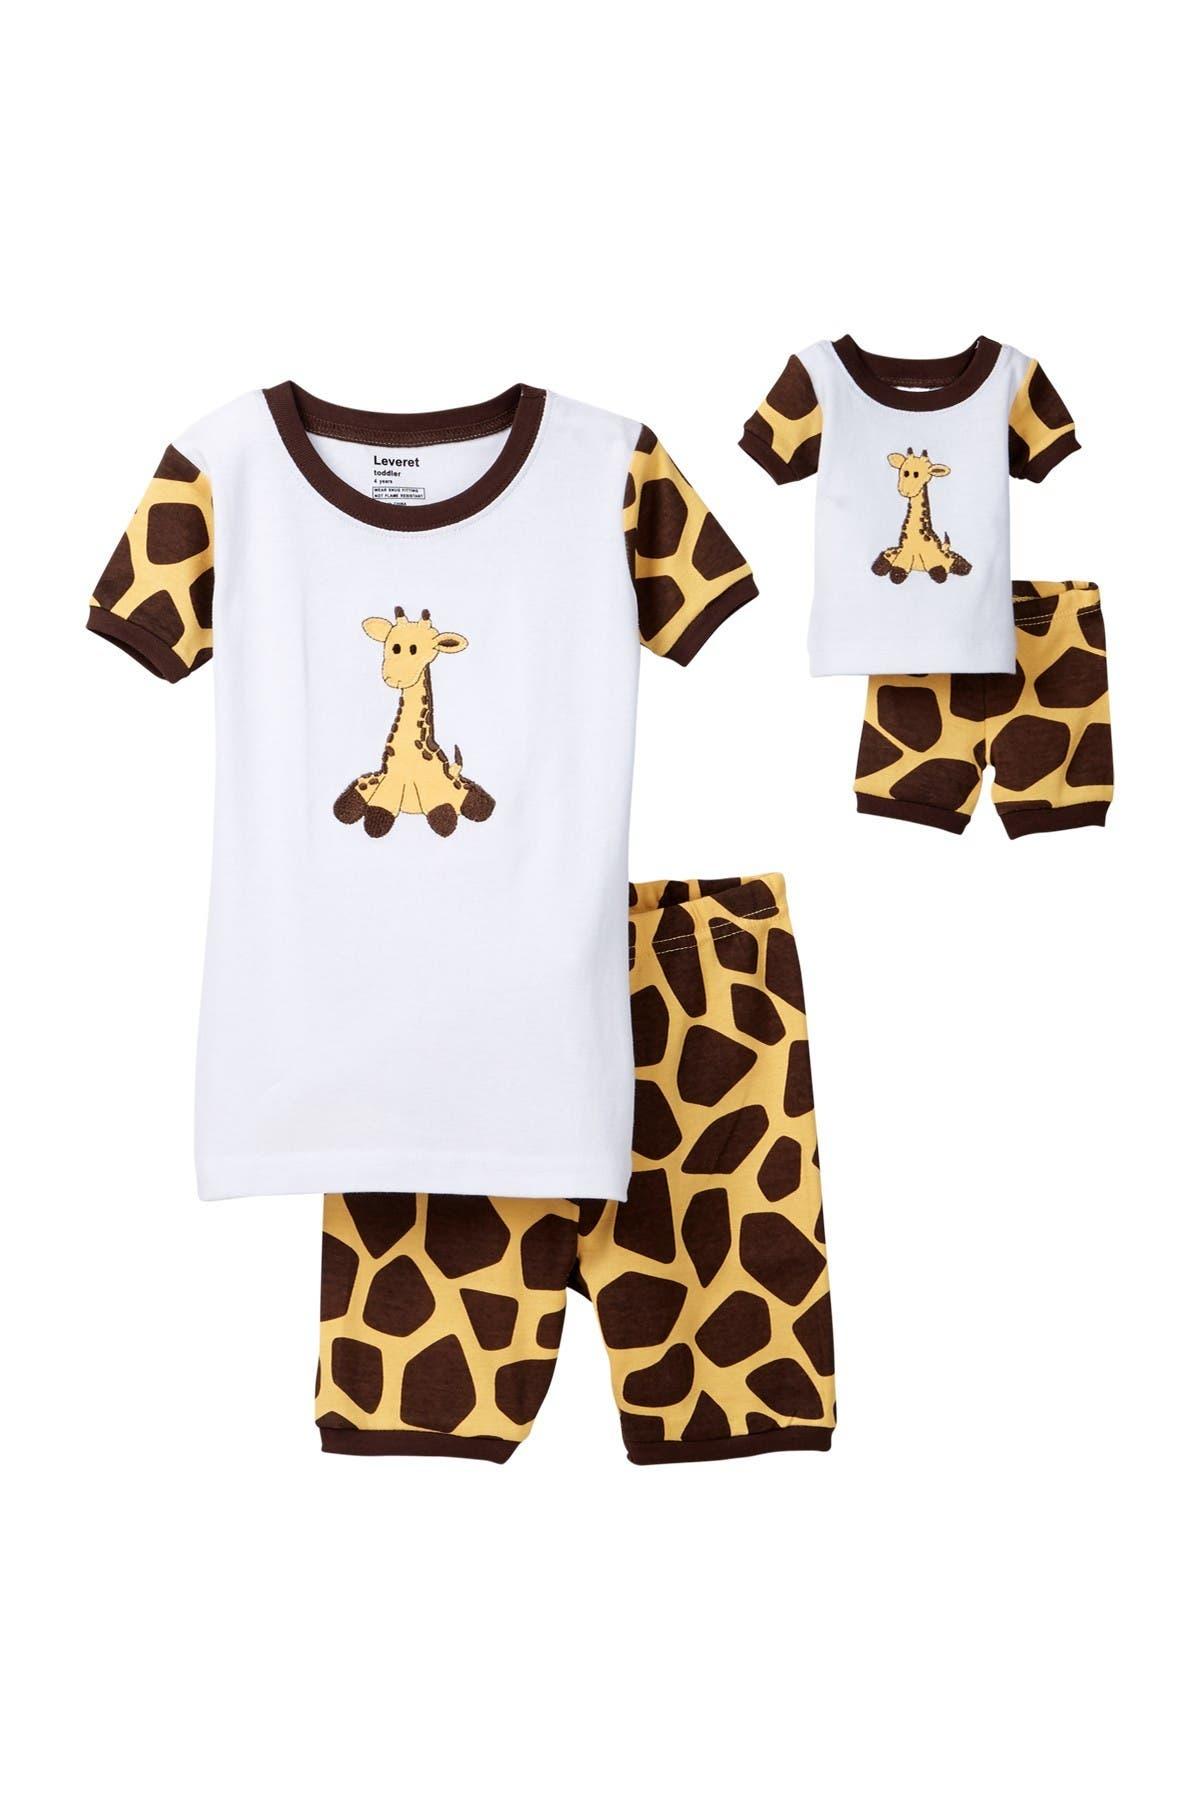 Image of Leveret Giraffe Pajama & Matching Doll Pajama Set